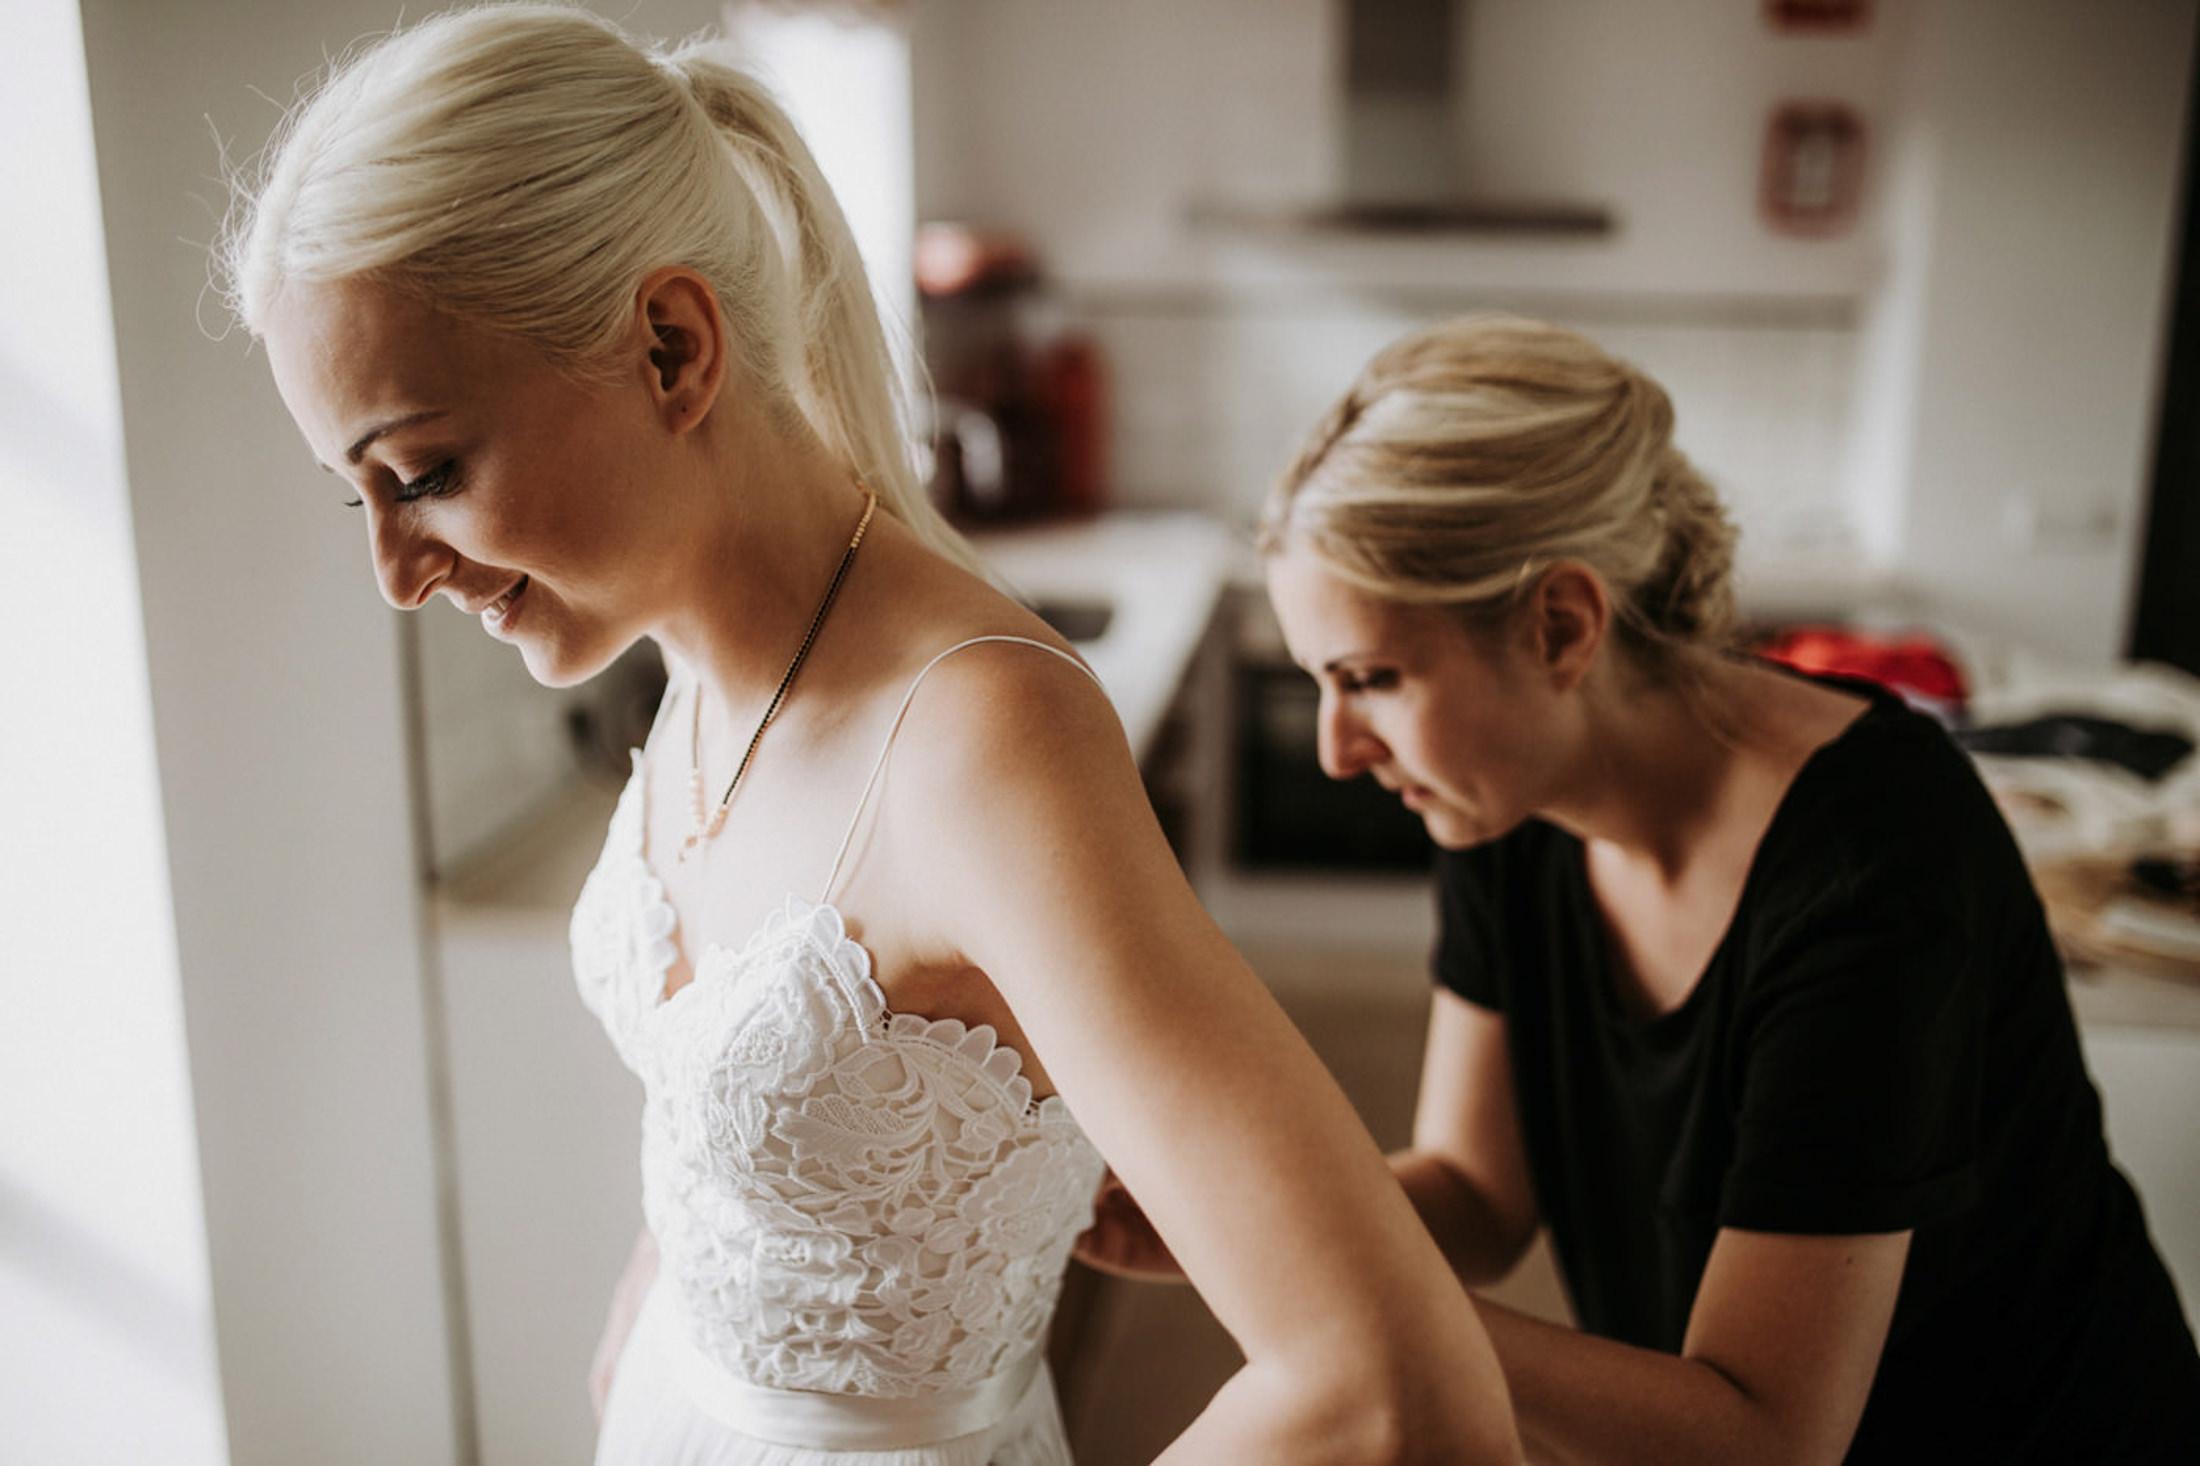 Wedding_Photographer_Mallorca_Daniela-Marquardt_Photography_New_York_Iceland_Tuscany_Santorini_Portugal_Austria_Bavaria_Elopement_Hochzeitsfotograf_AntjeRajat2_73